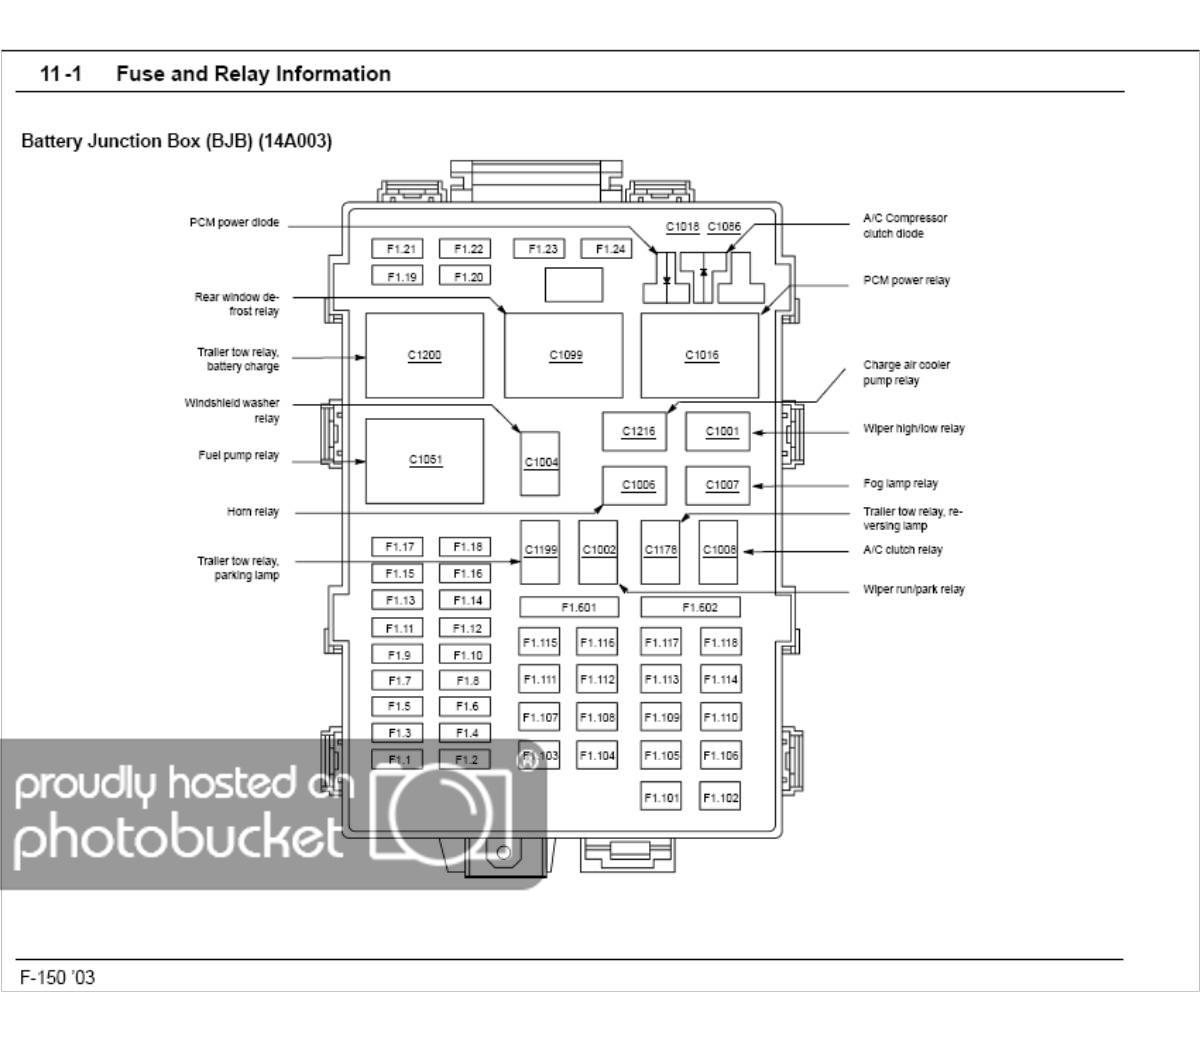 ford starter solenoid wiring diagram wirings diagram2000 ford f150 xlt fuse diagram wiring diagram detailed ford starter solenoid wiring diagram